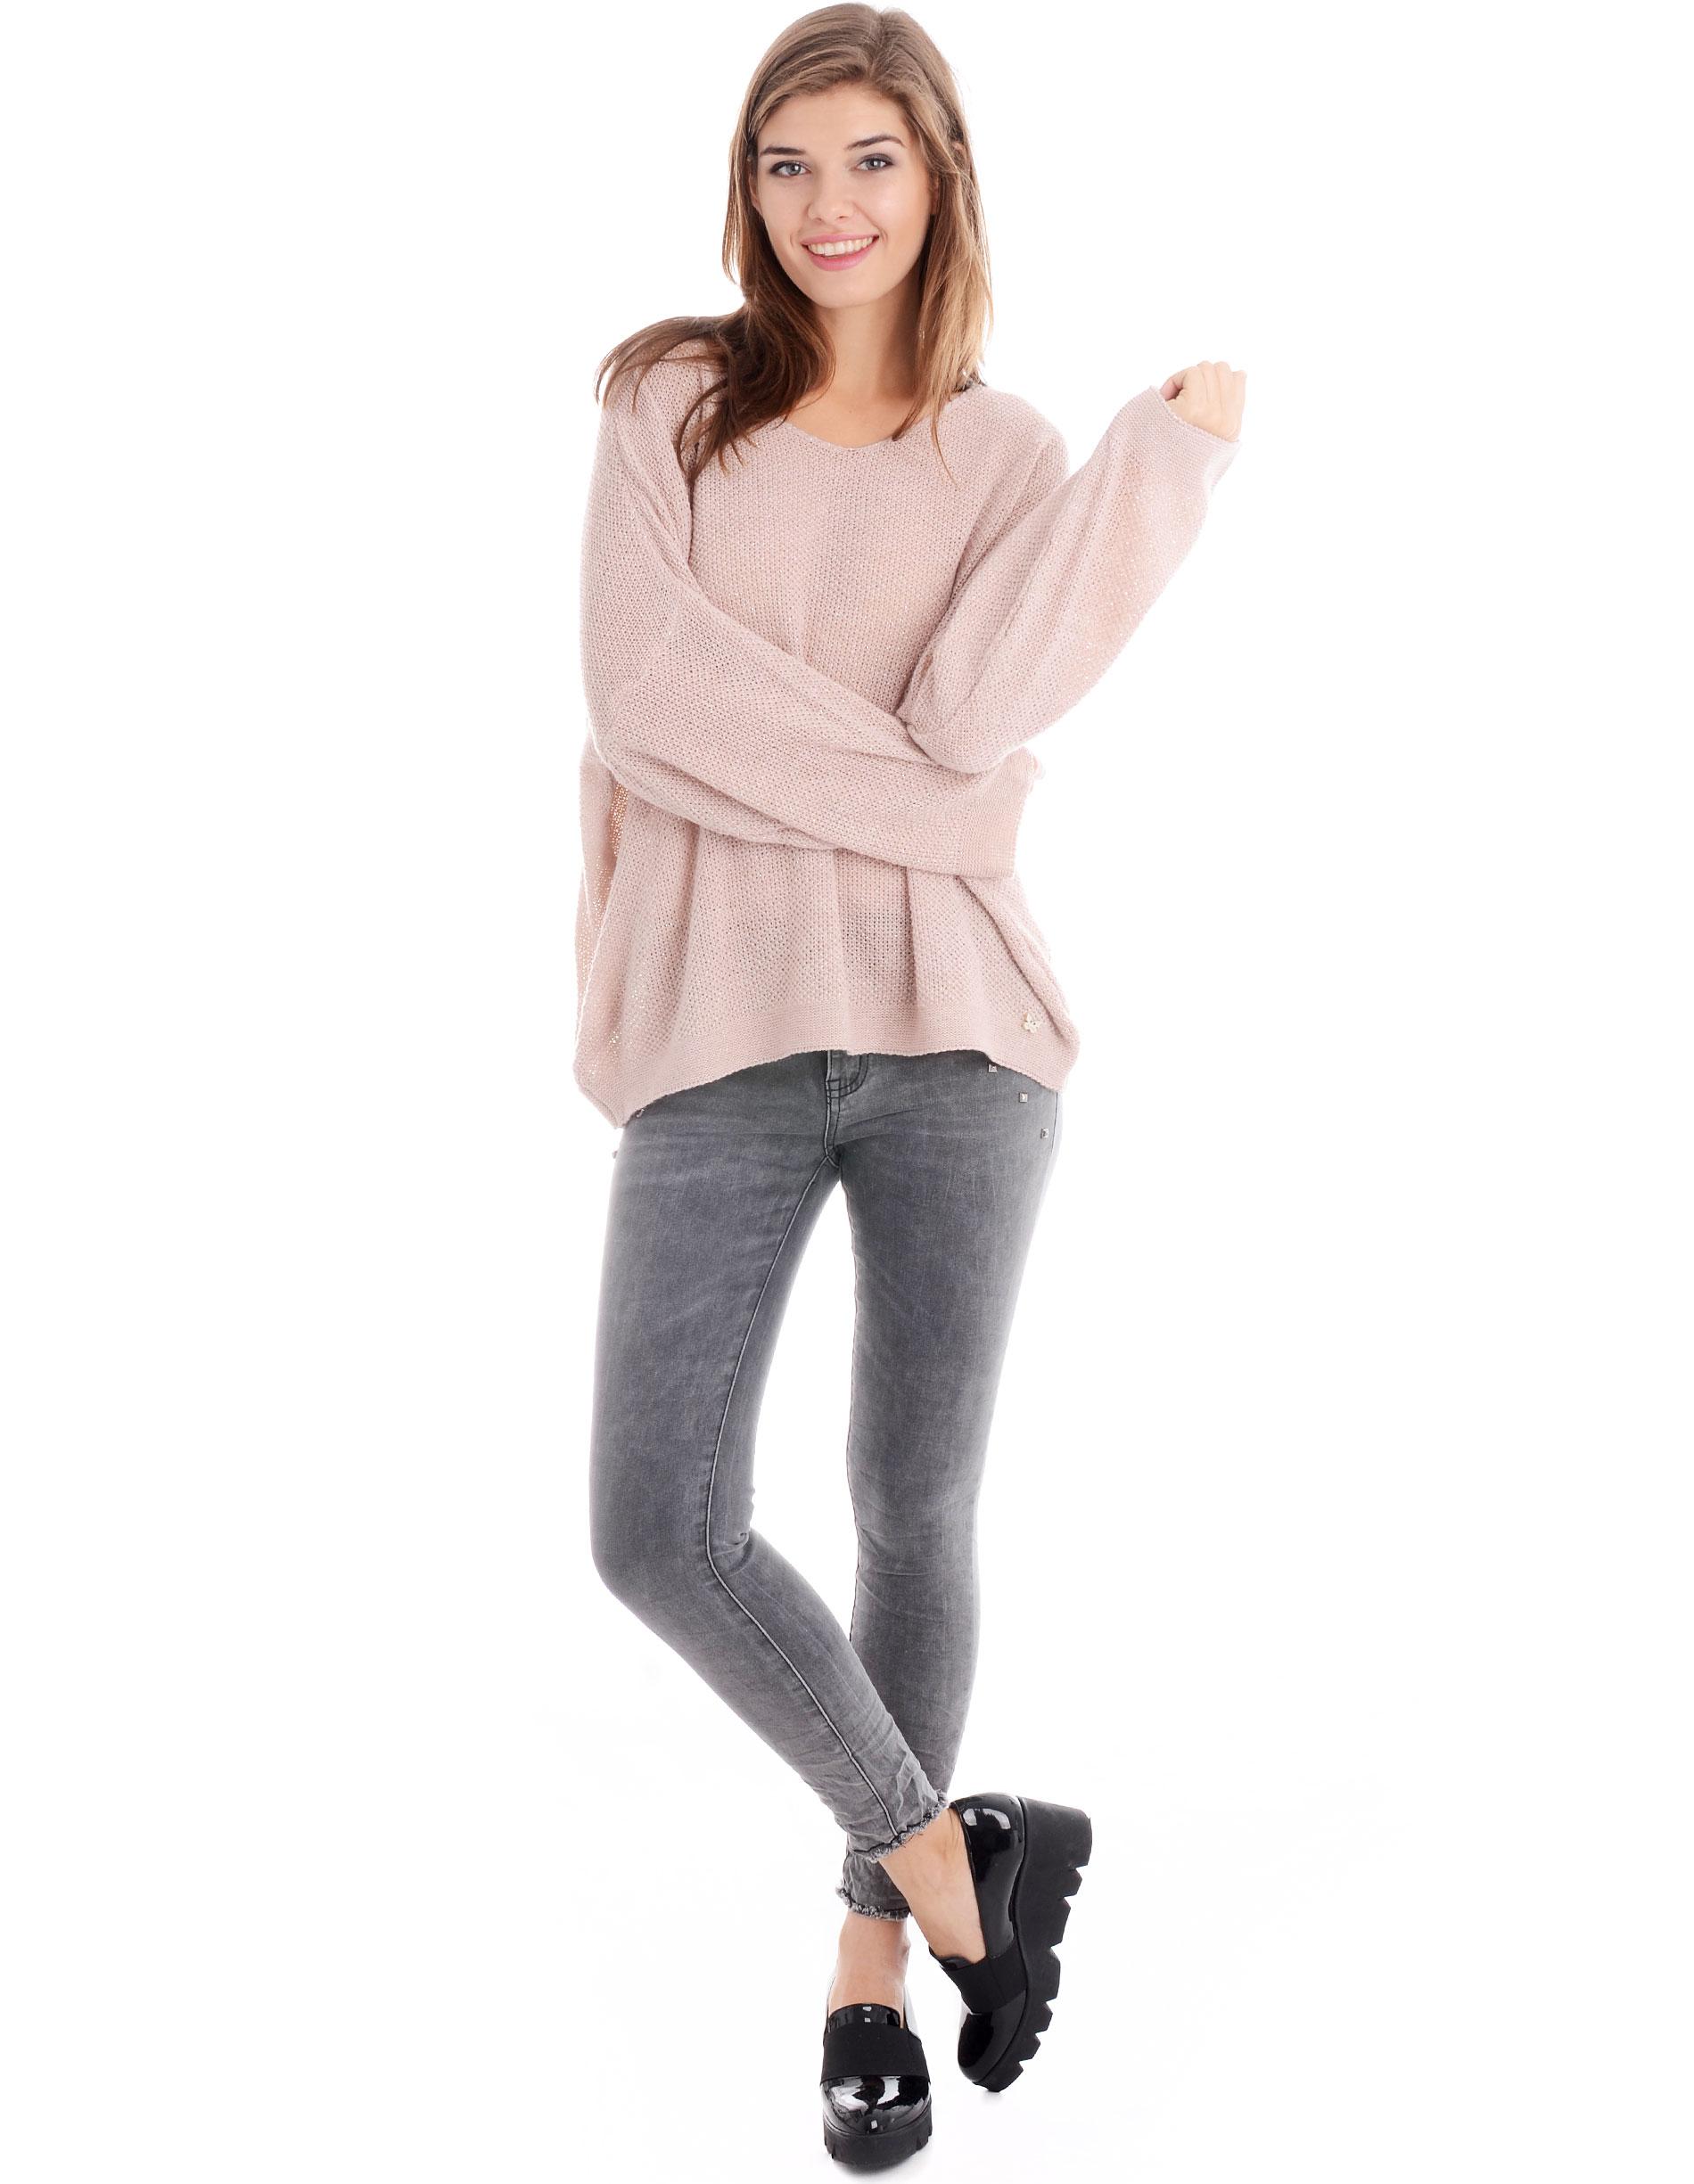 Spodnie - 42-6092 GRIGI - Unisono